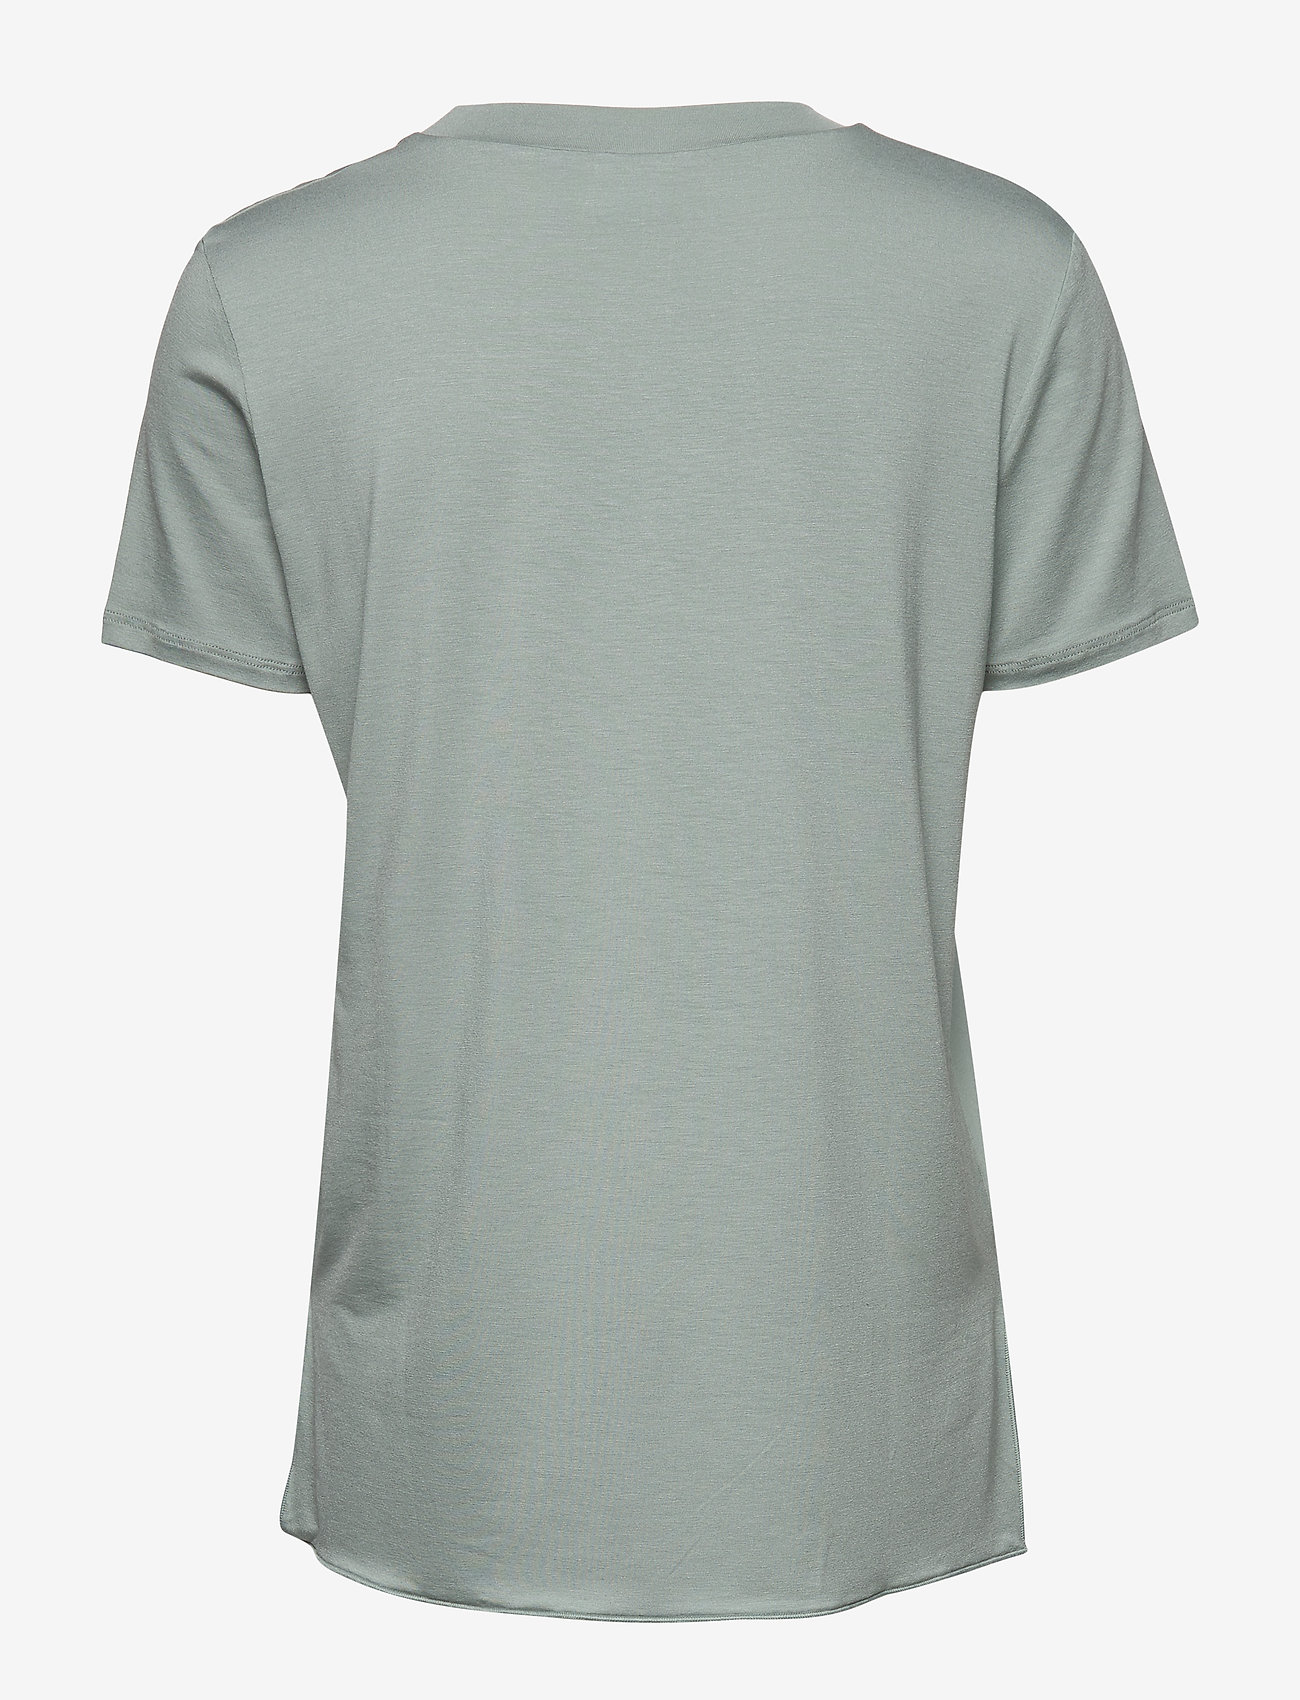 Max Mara Leisure - GENE - t-shirts - pastel green - 1